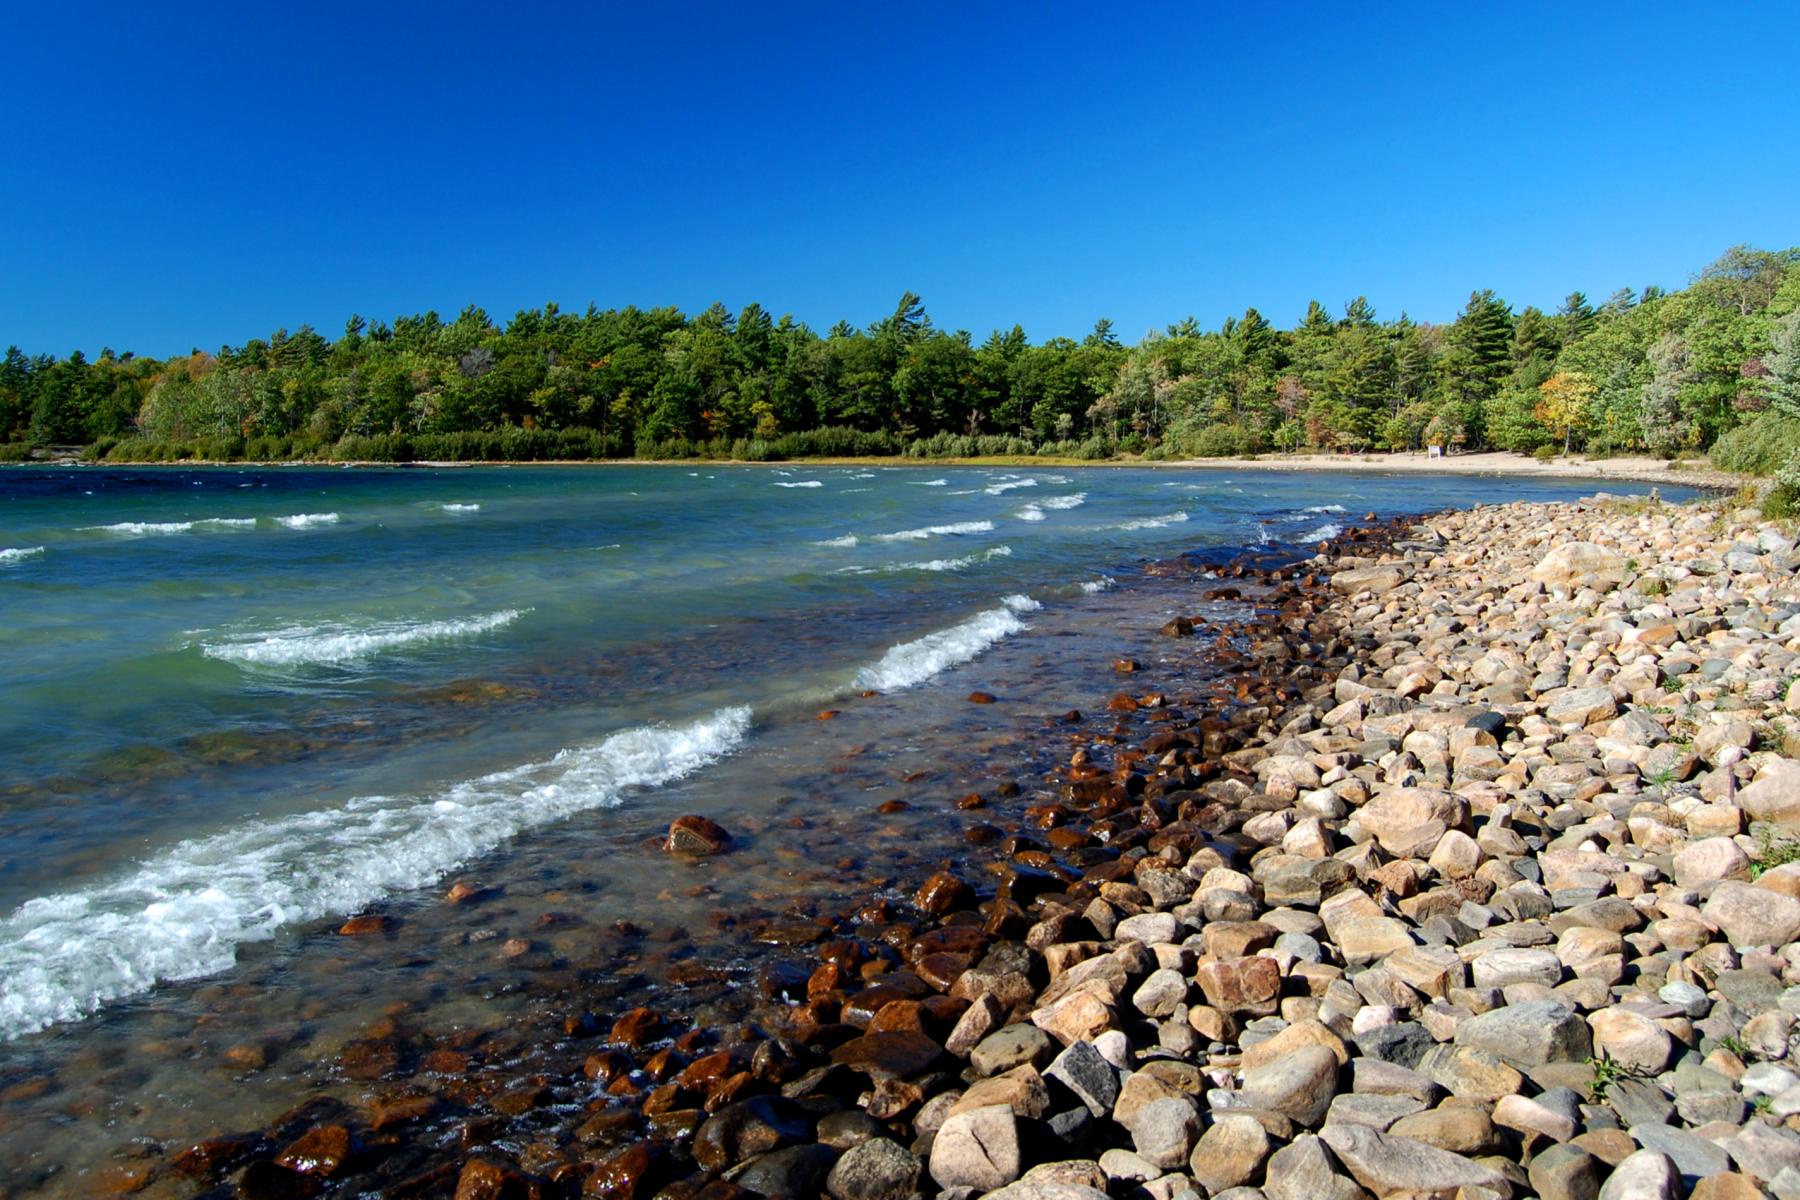 File:Rocky beach at Killbear Provincial Park.jpg - Wikimedia Commons